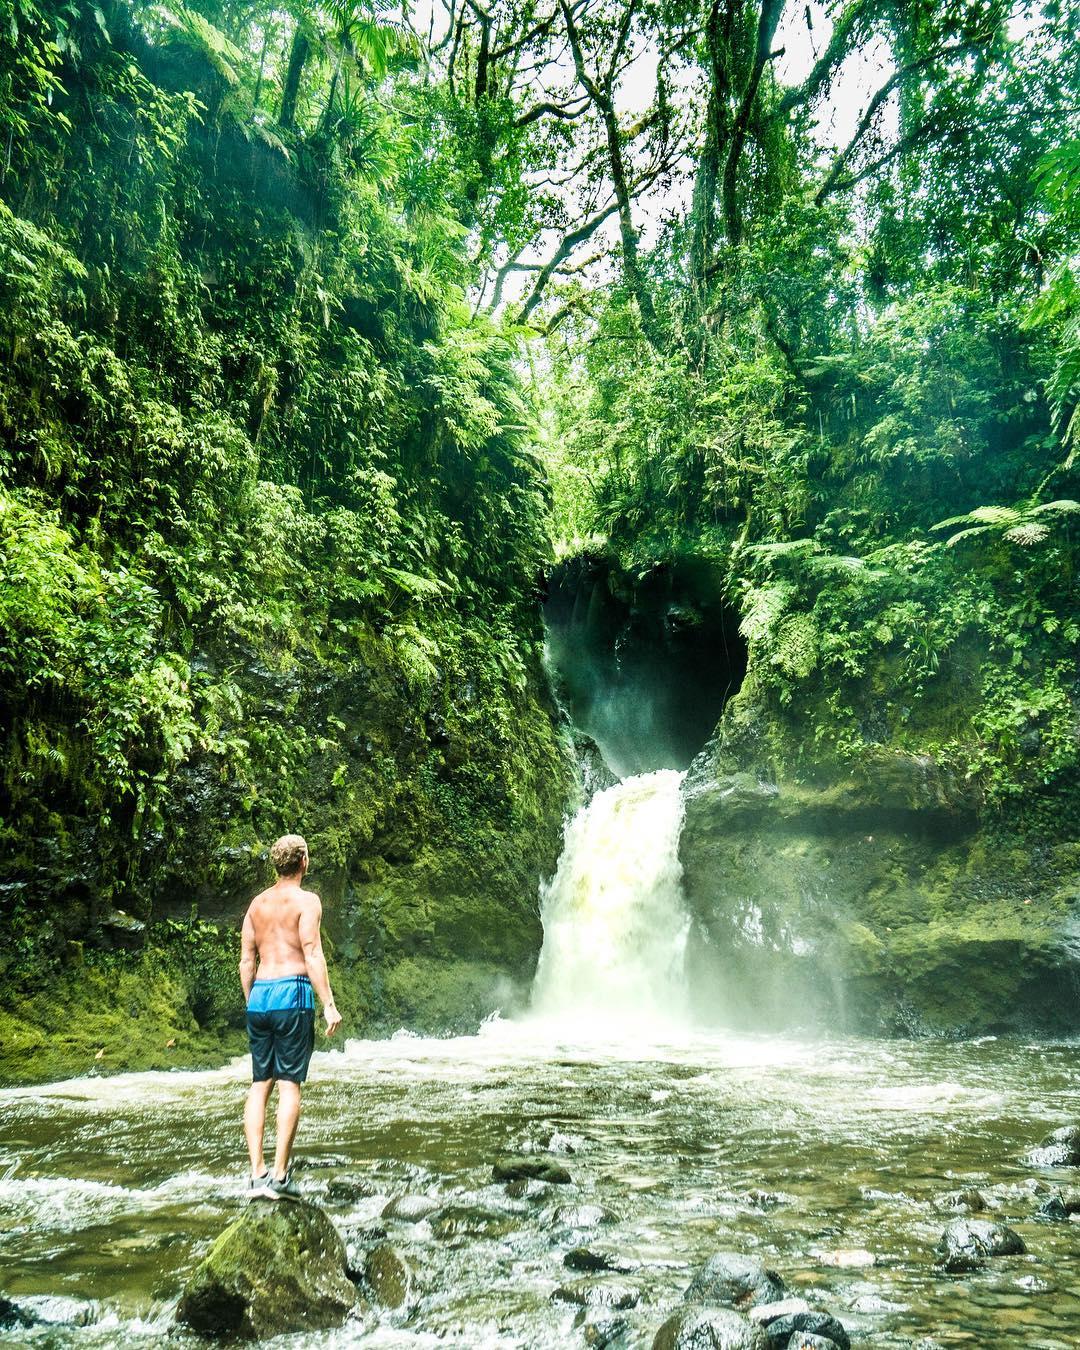 Микронезия и Маршалловы острова на снимках Роберта Майкла Пула